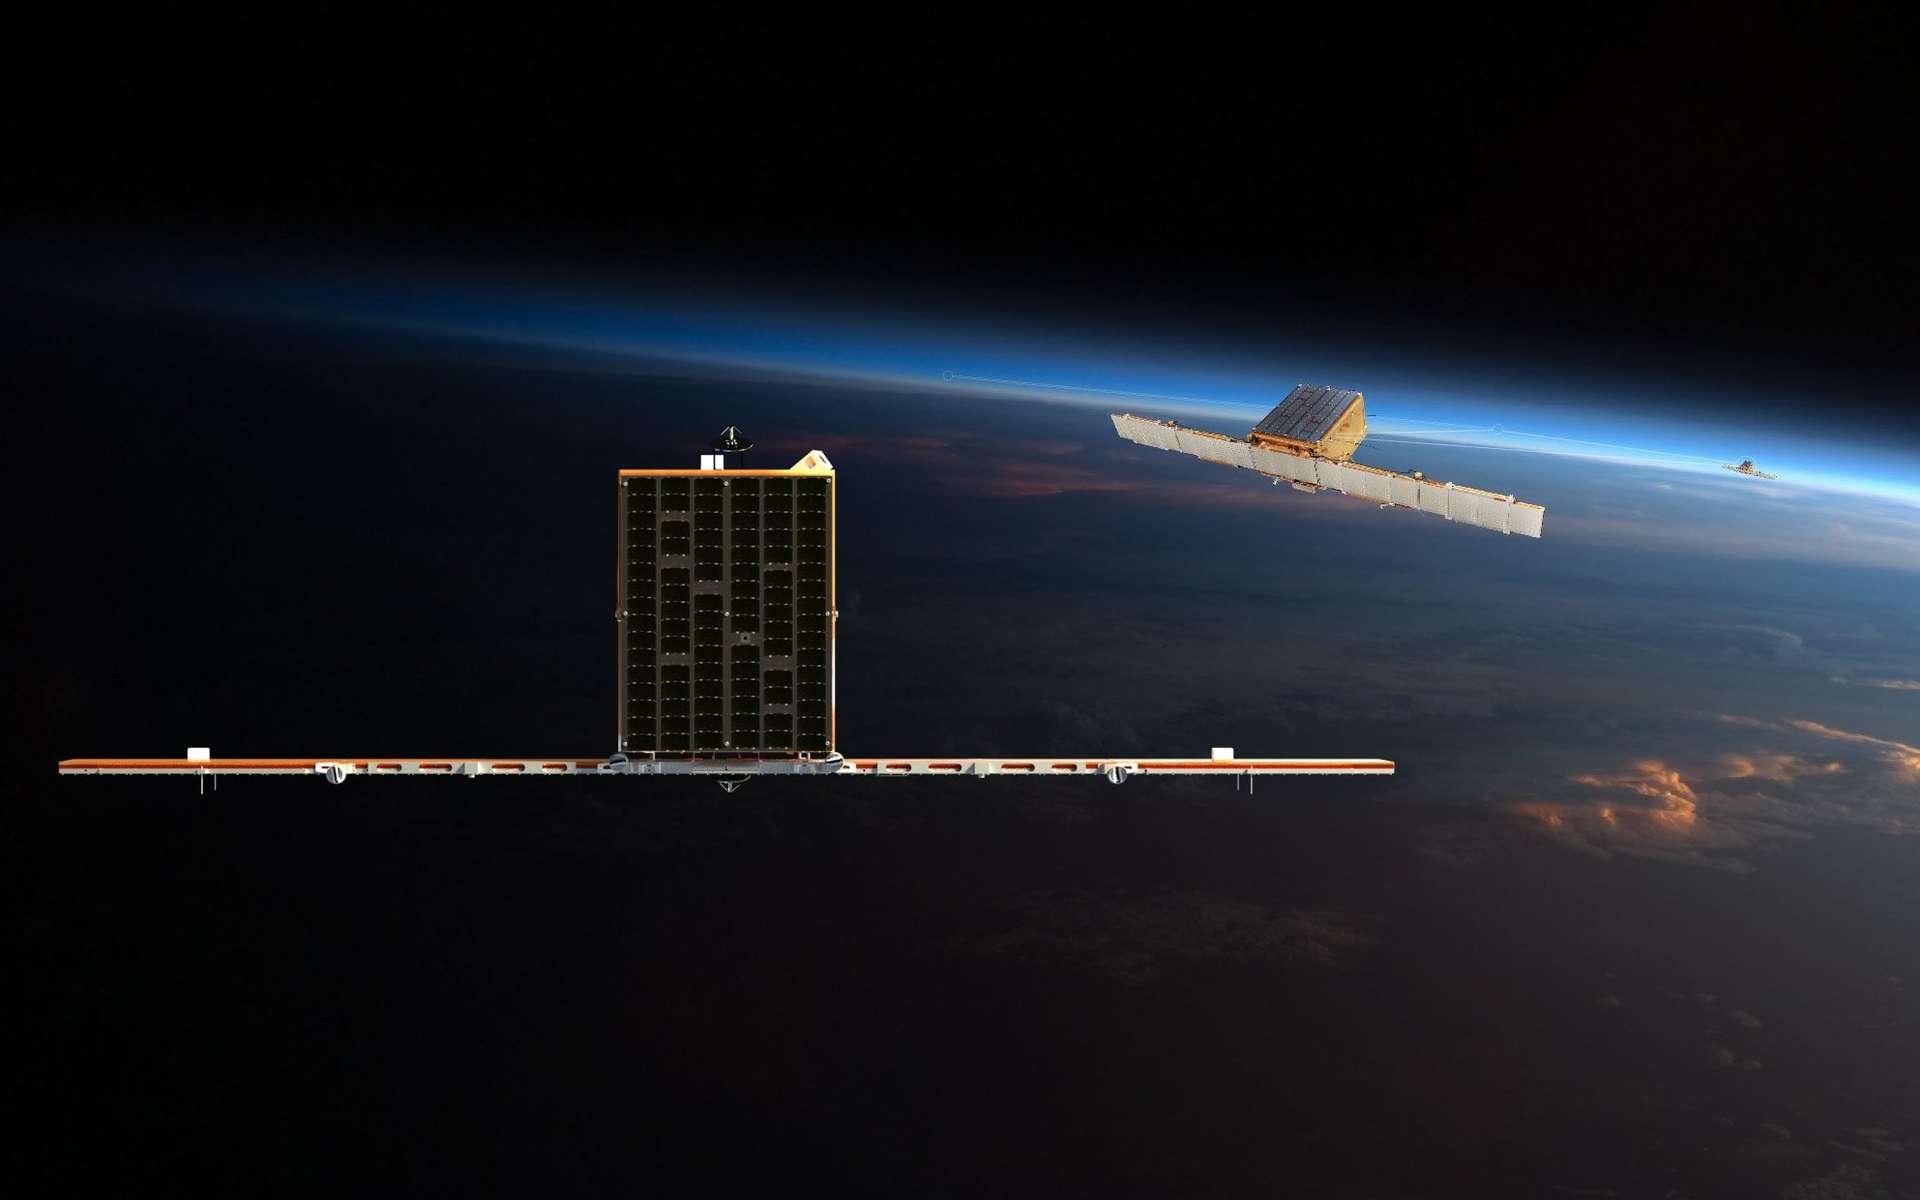 Les constellations de microsatellites sont mis en orbite basse. © ICEYE